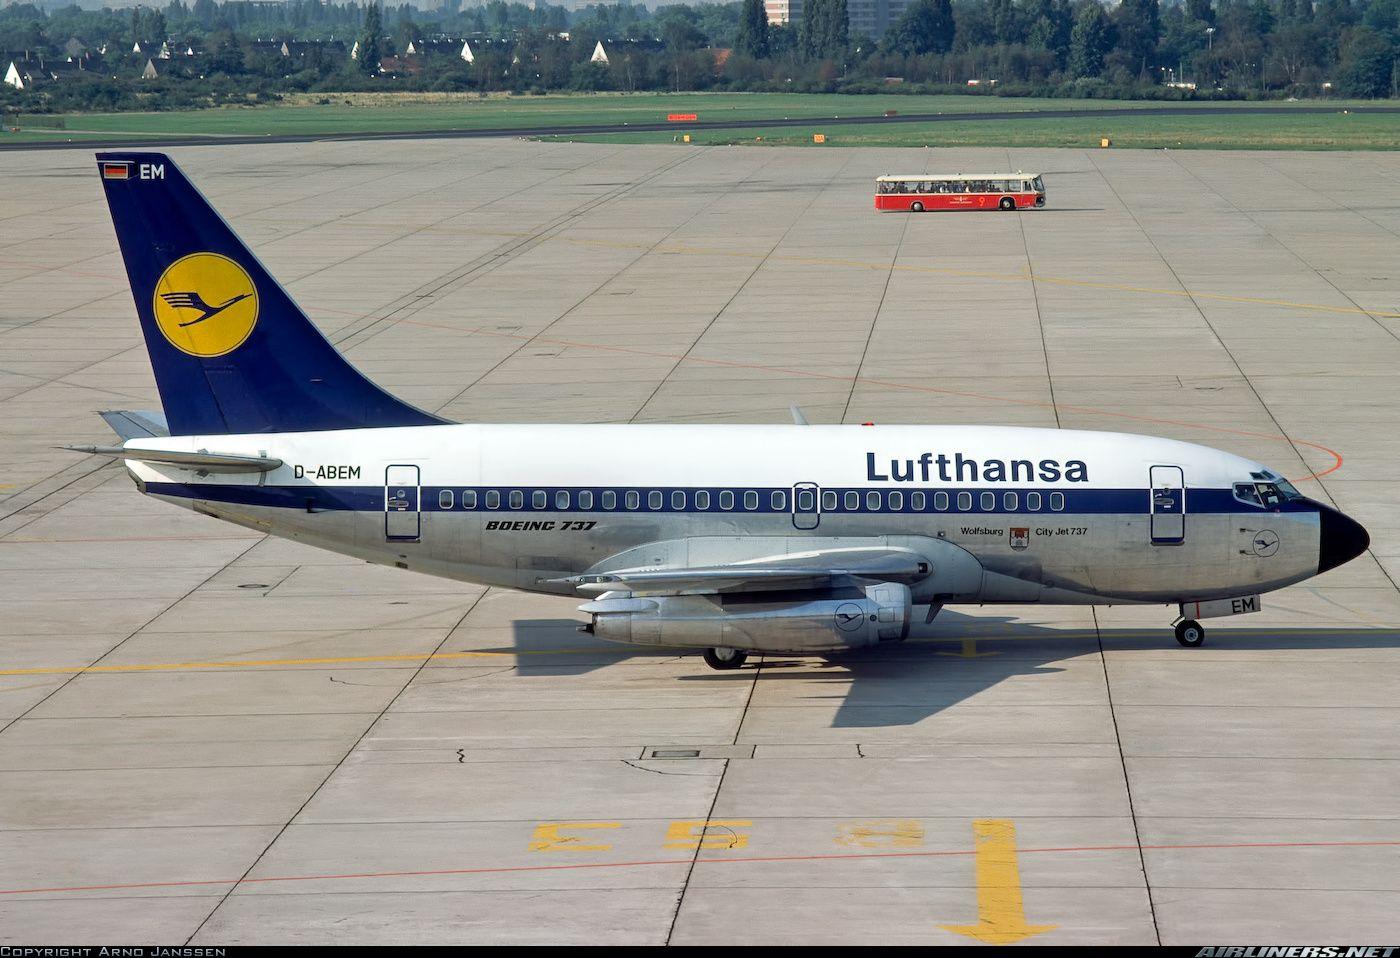 Lufthansa D-ABEM Boeing 737-130 aircraft picture